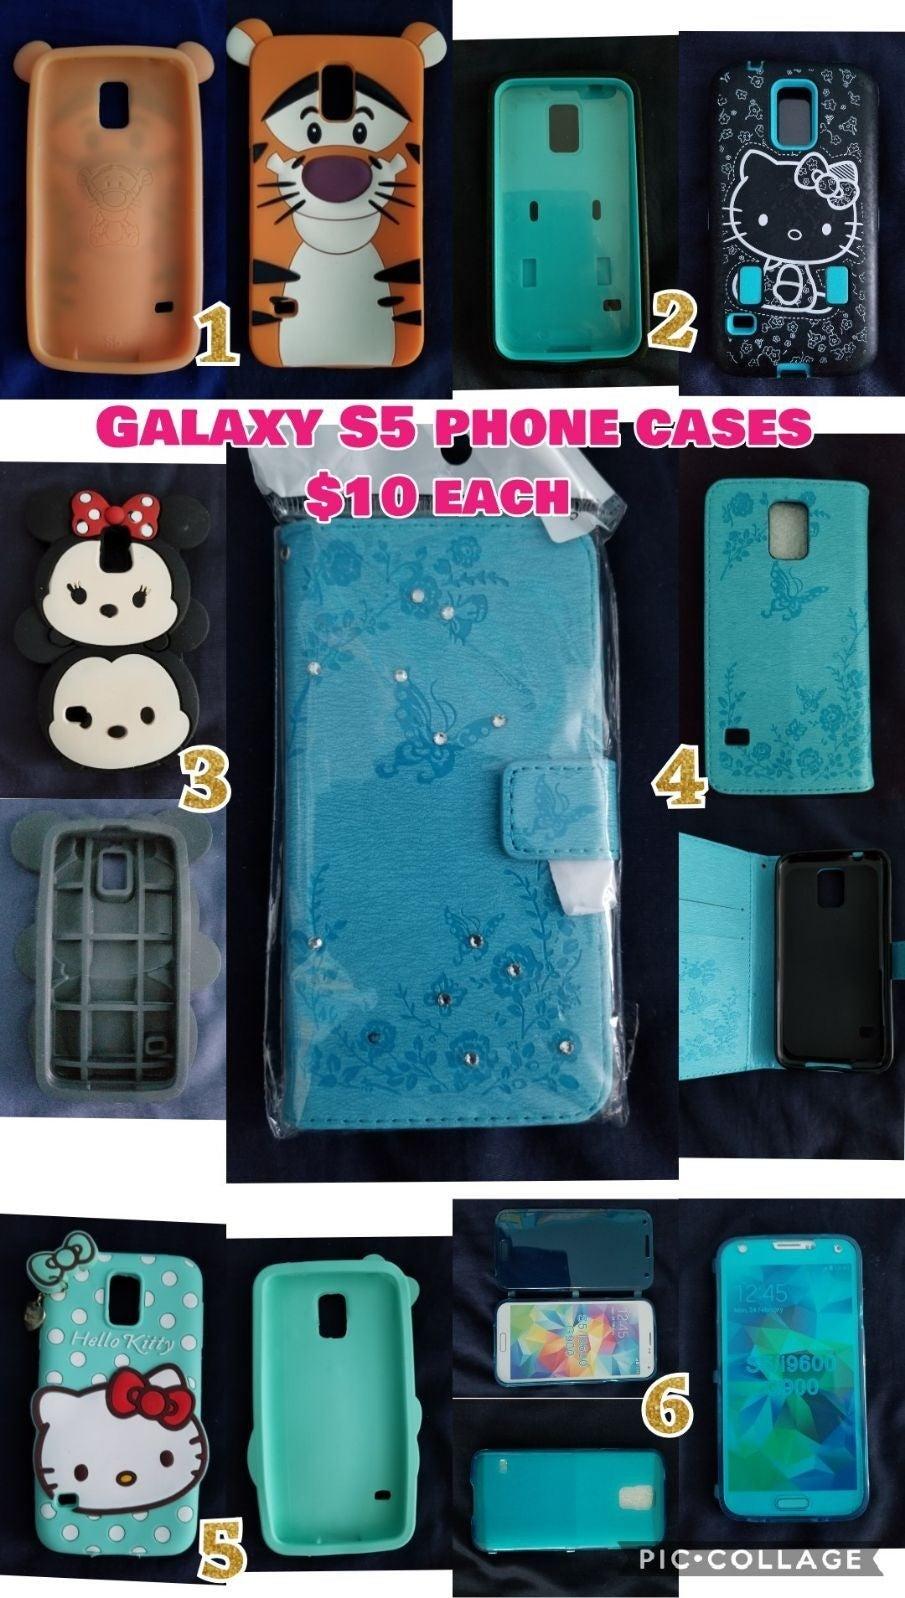 Galaxy S5 phone cases